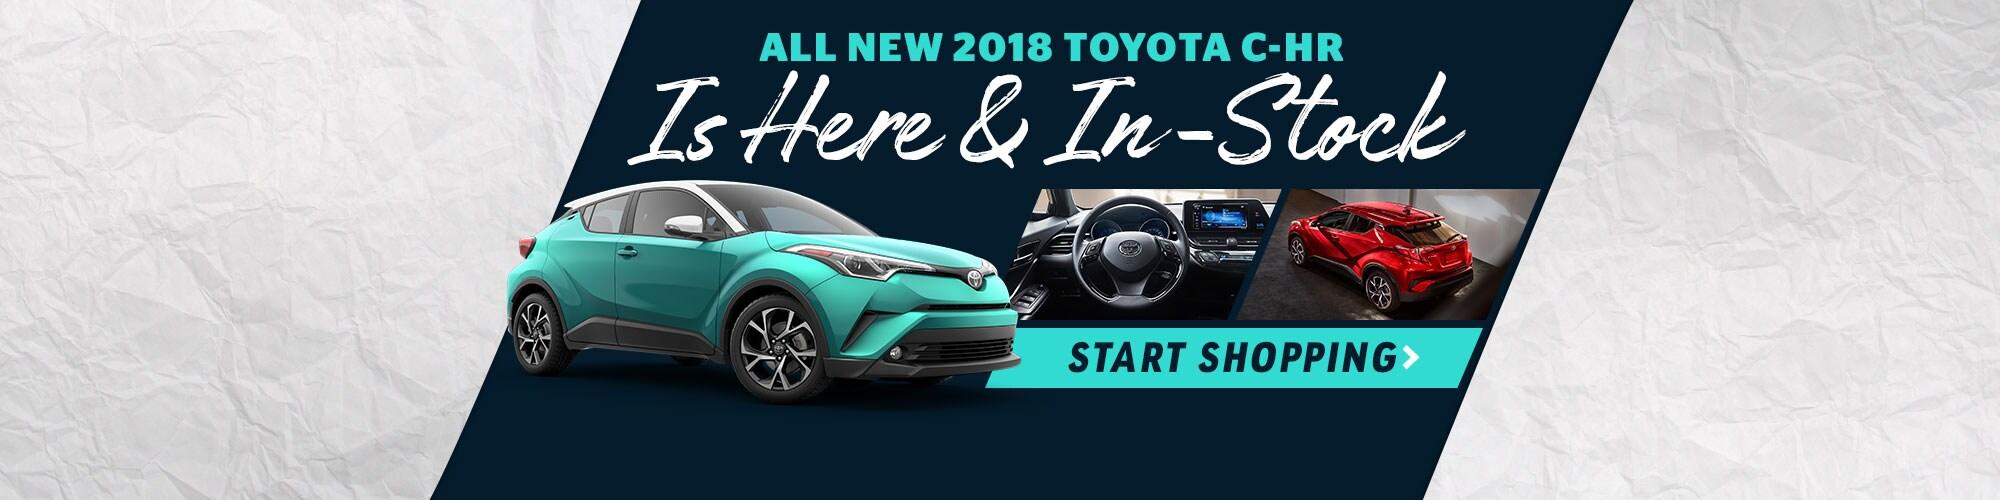 Toyota dealership in sanford nc fuquay varina fayetteville